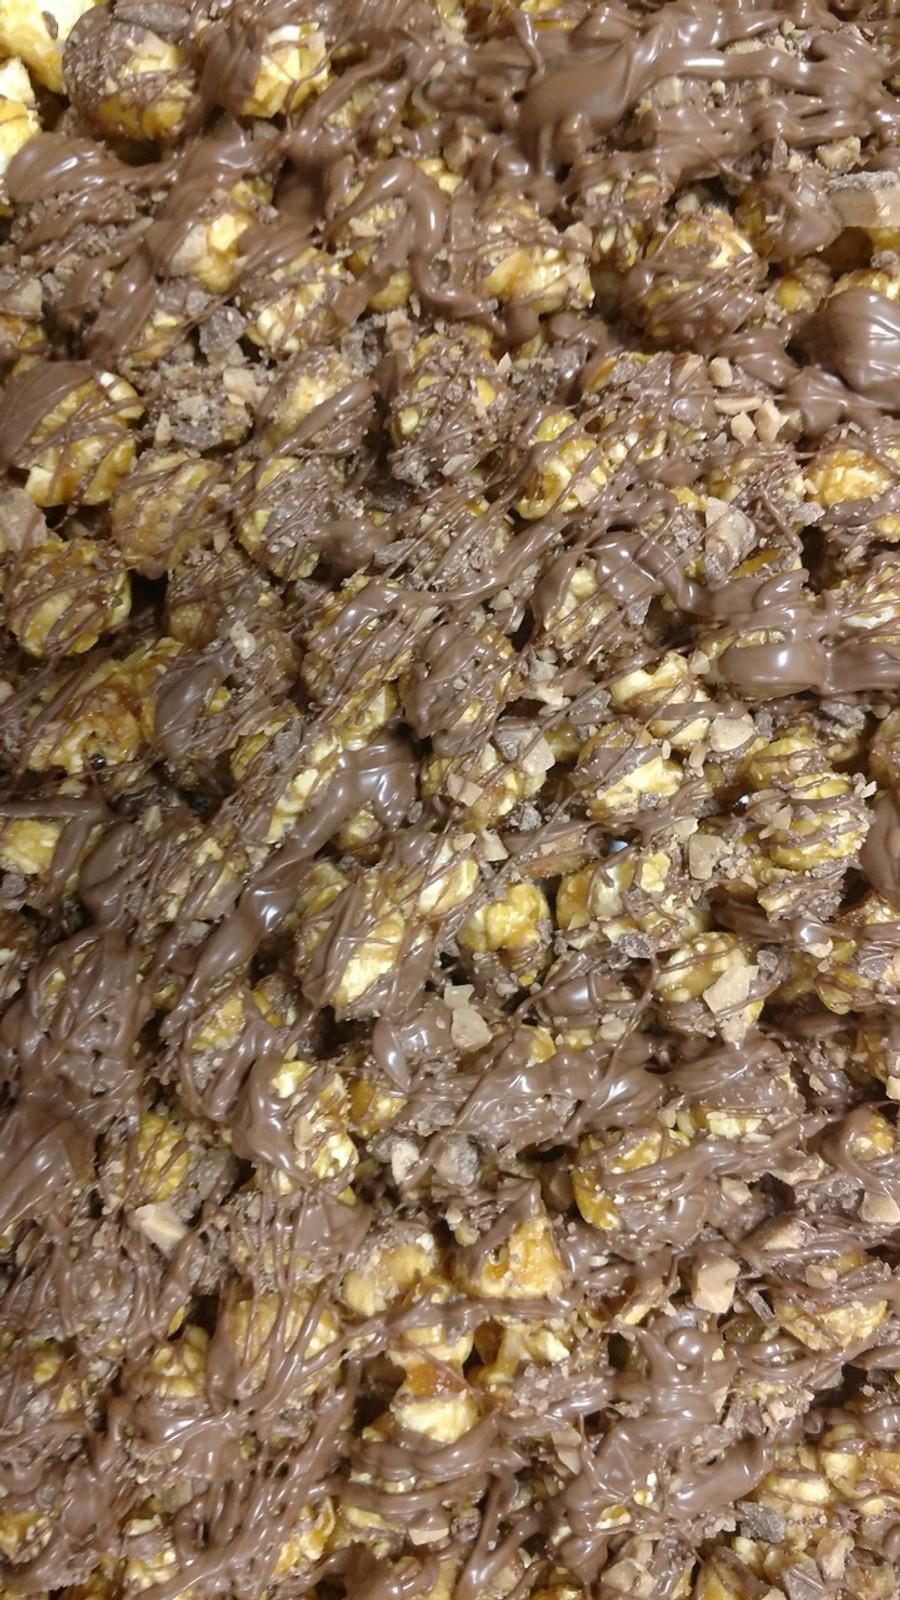 Heath® Toffee Almond Popcorn